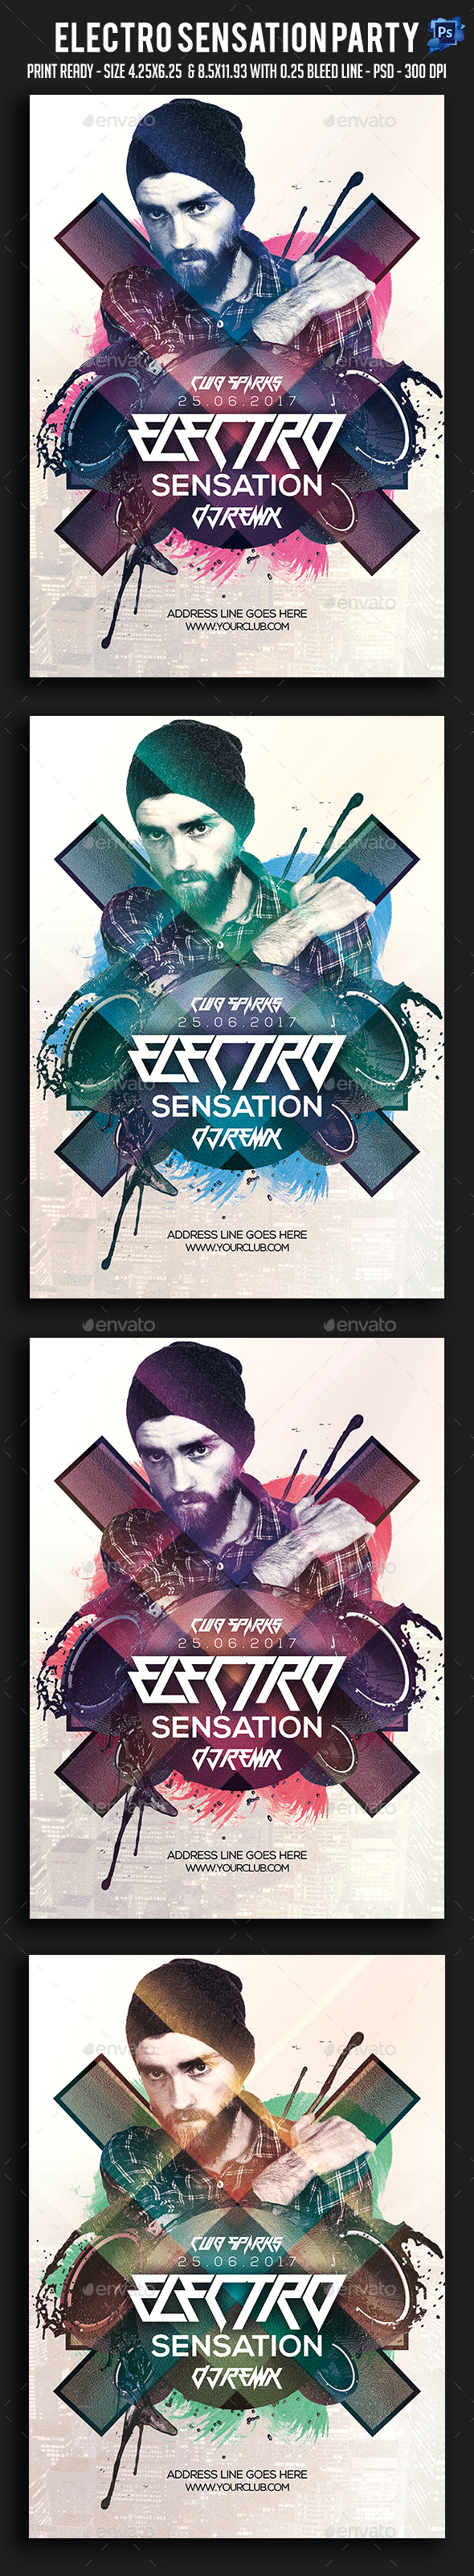 Electro Sensation Party Flyer - Clubs & Parties Events